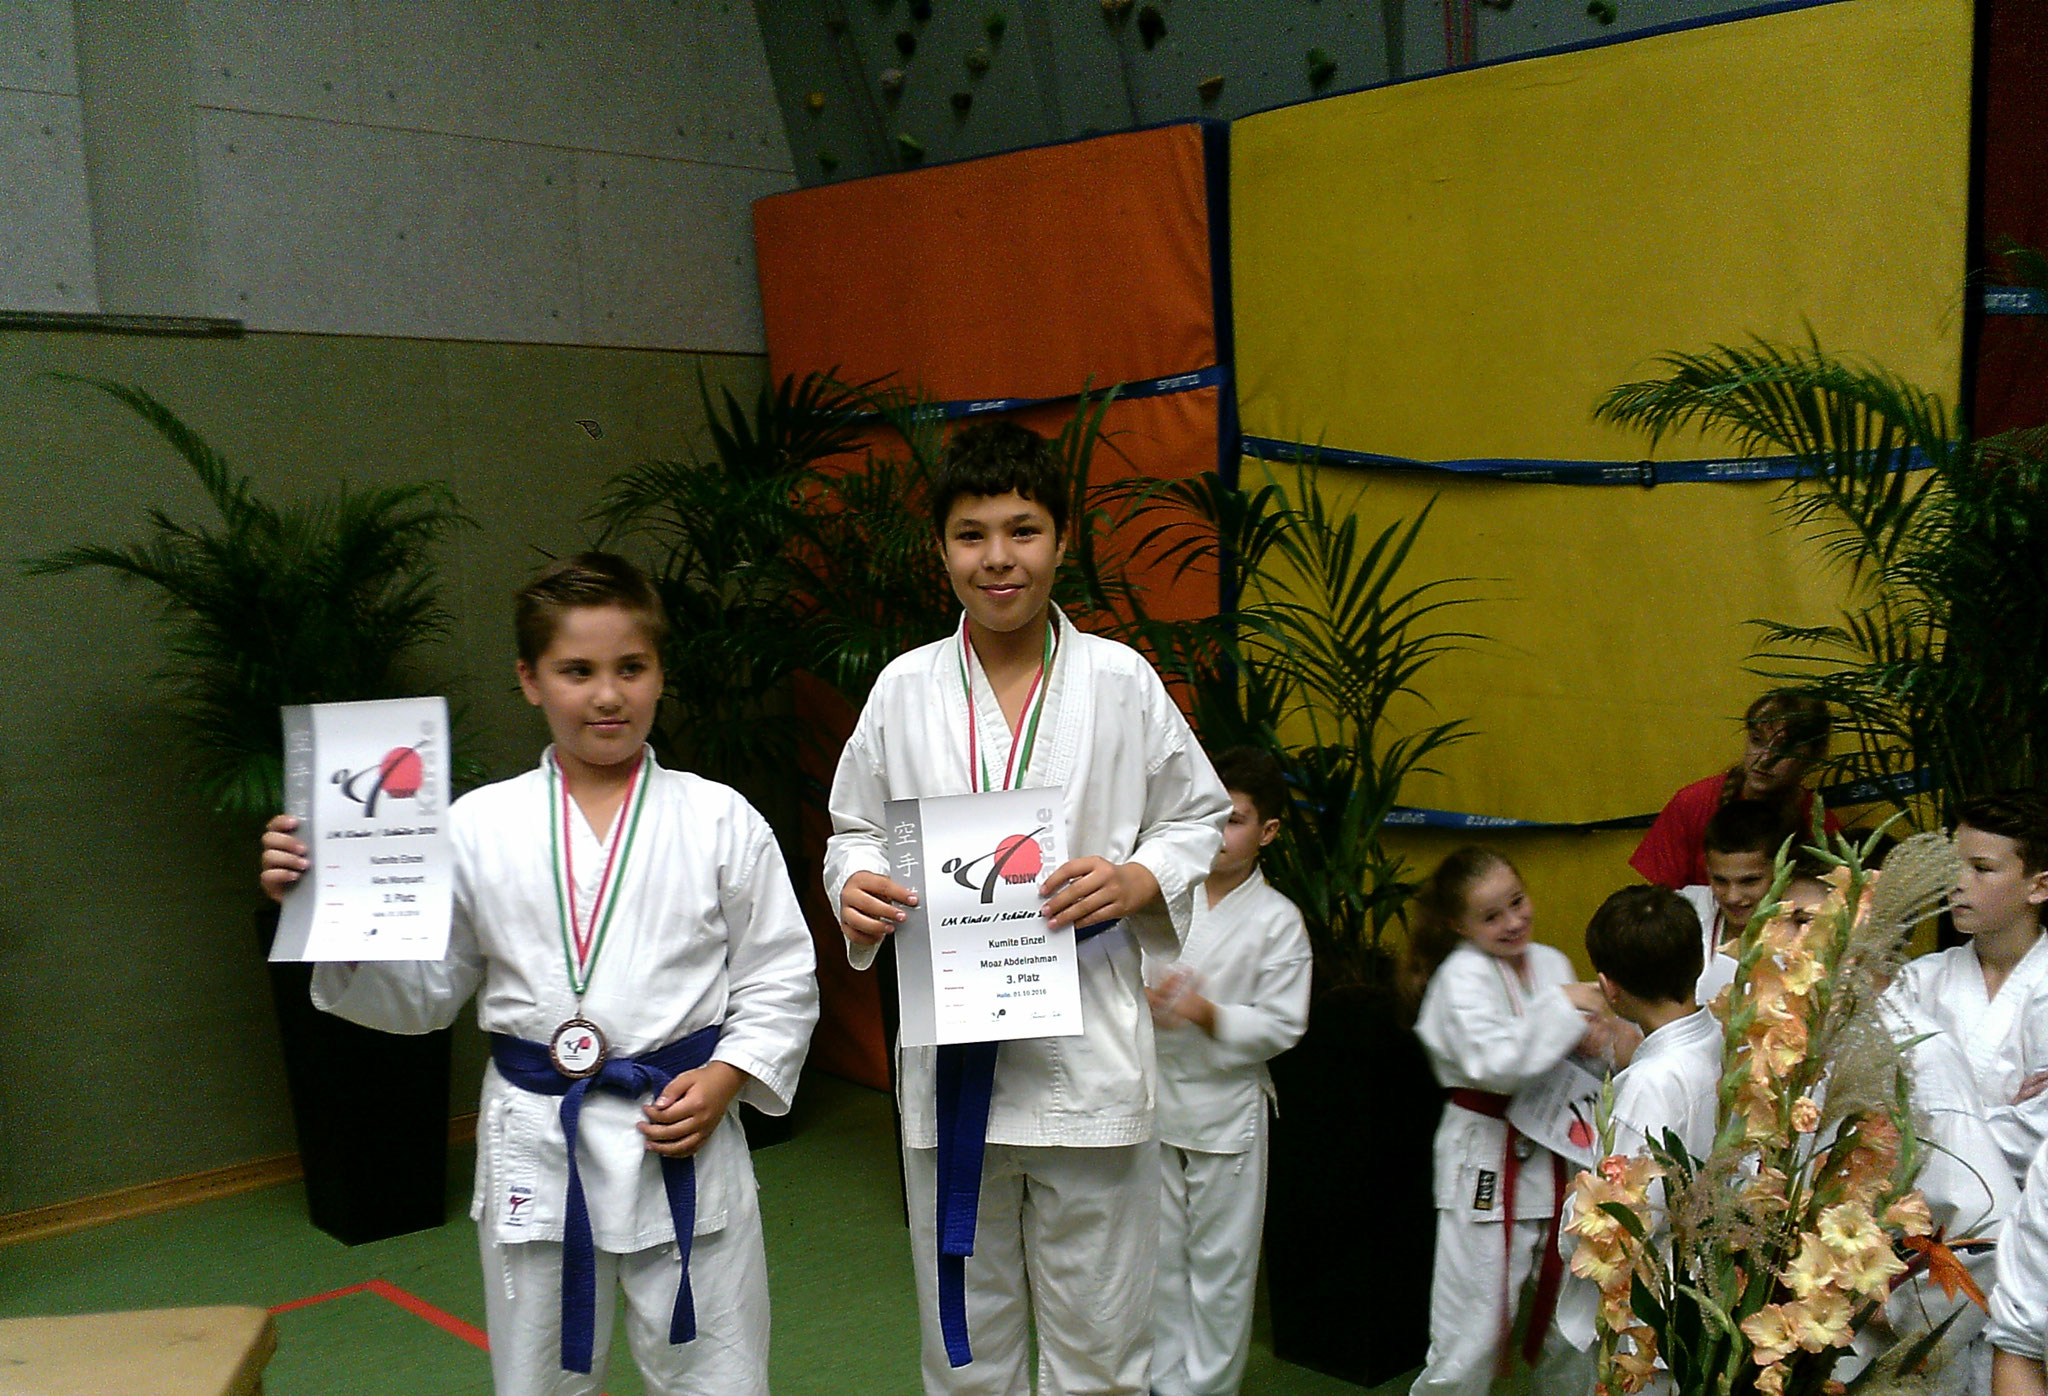 3. Platz – Moaz Abdelrahman – Kumite Kinder U12 +38kg